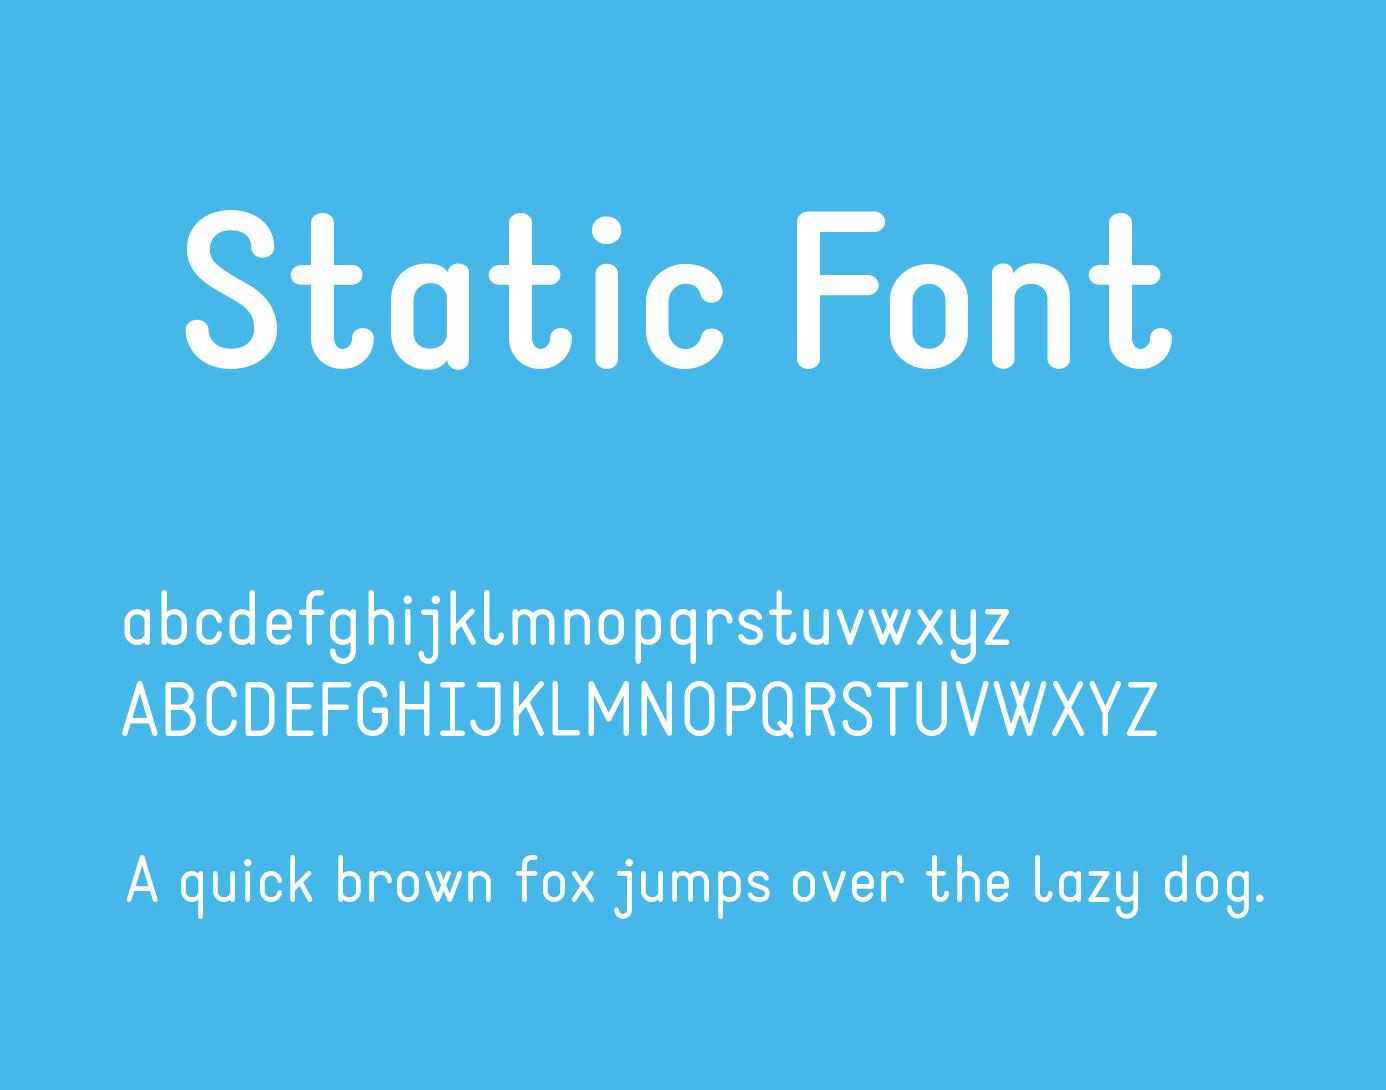 https://fontclarity.com/wp-content/uploads/2019/09/static-font-download-0.png Free Download